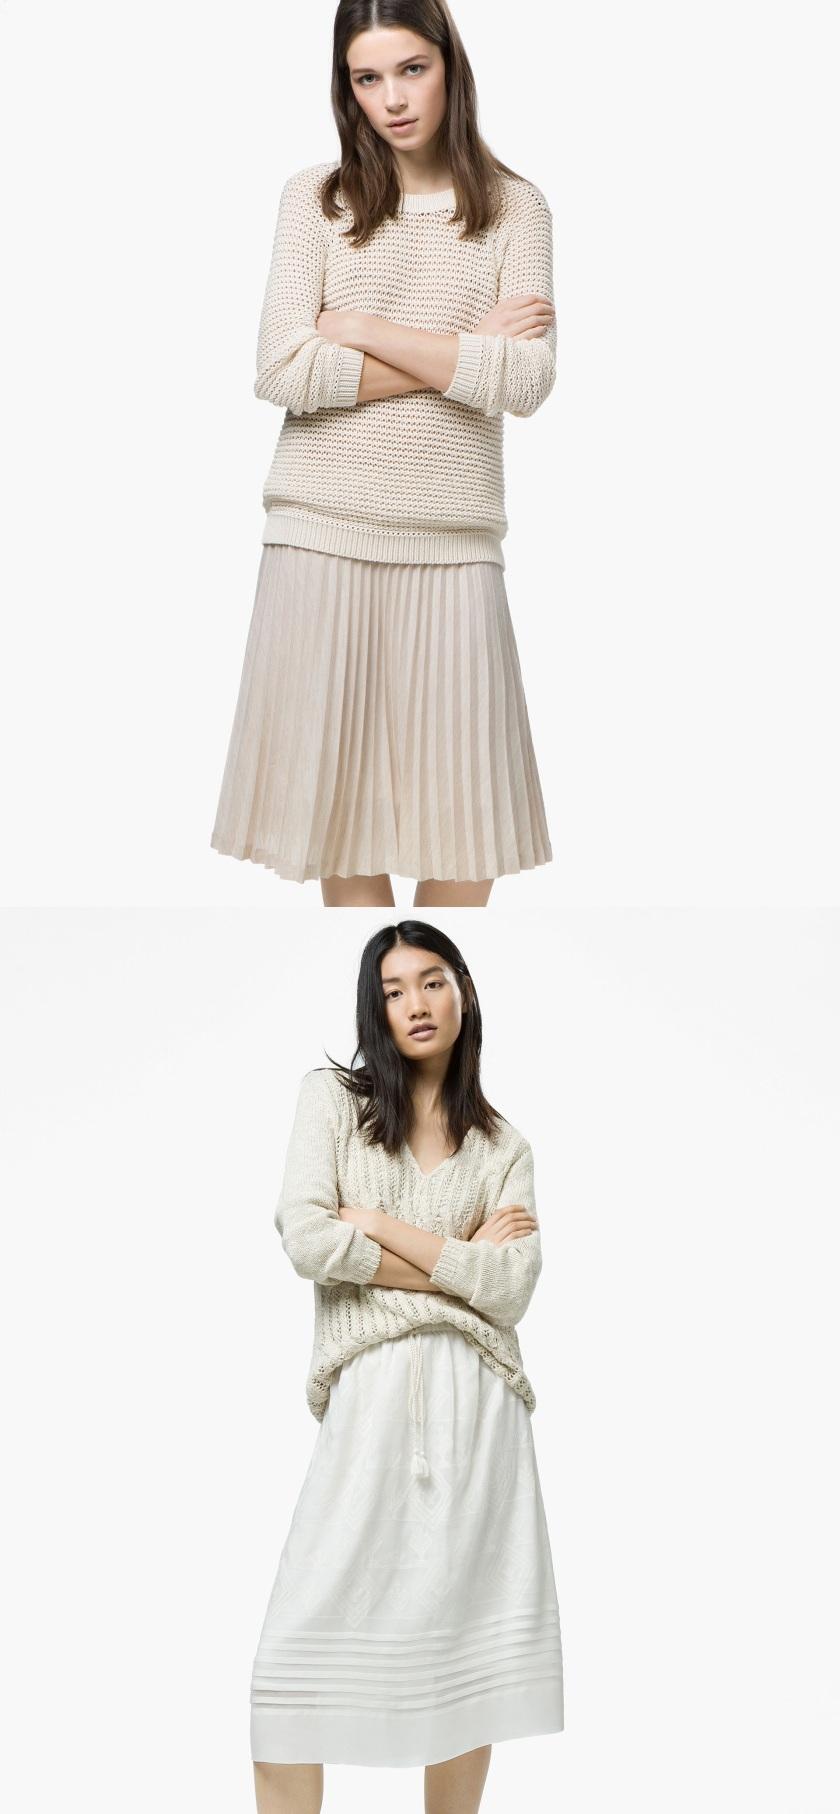 Cuida de ti, cuida tu imagen, faldas primavera verano 2015 Massimo Dutti ya es primavera 30